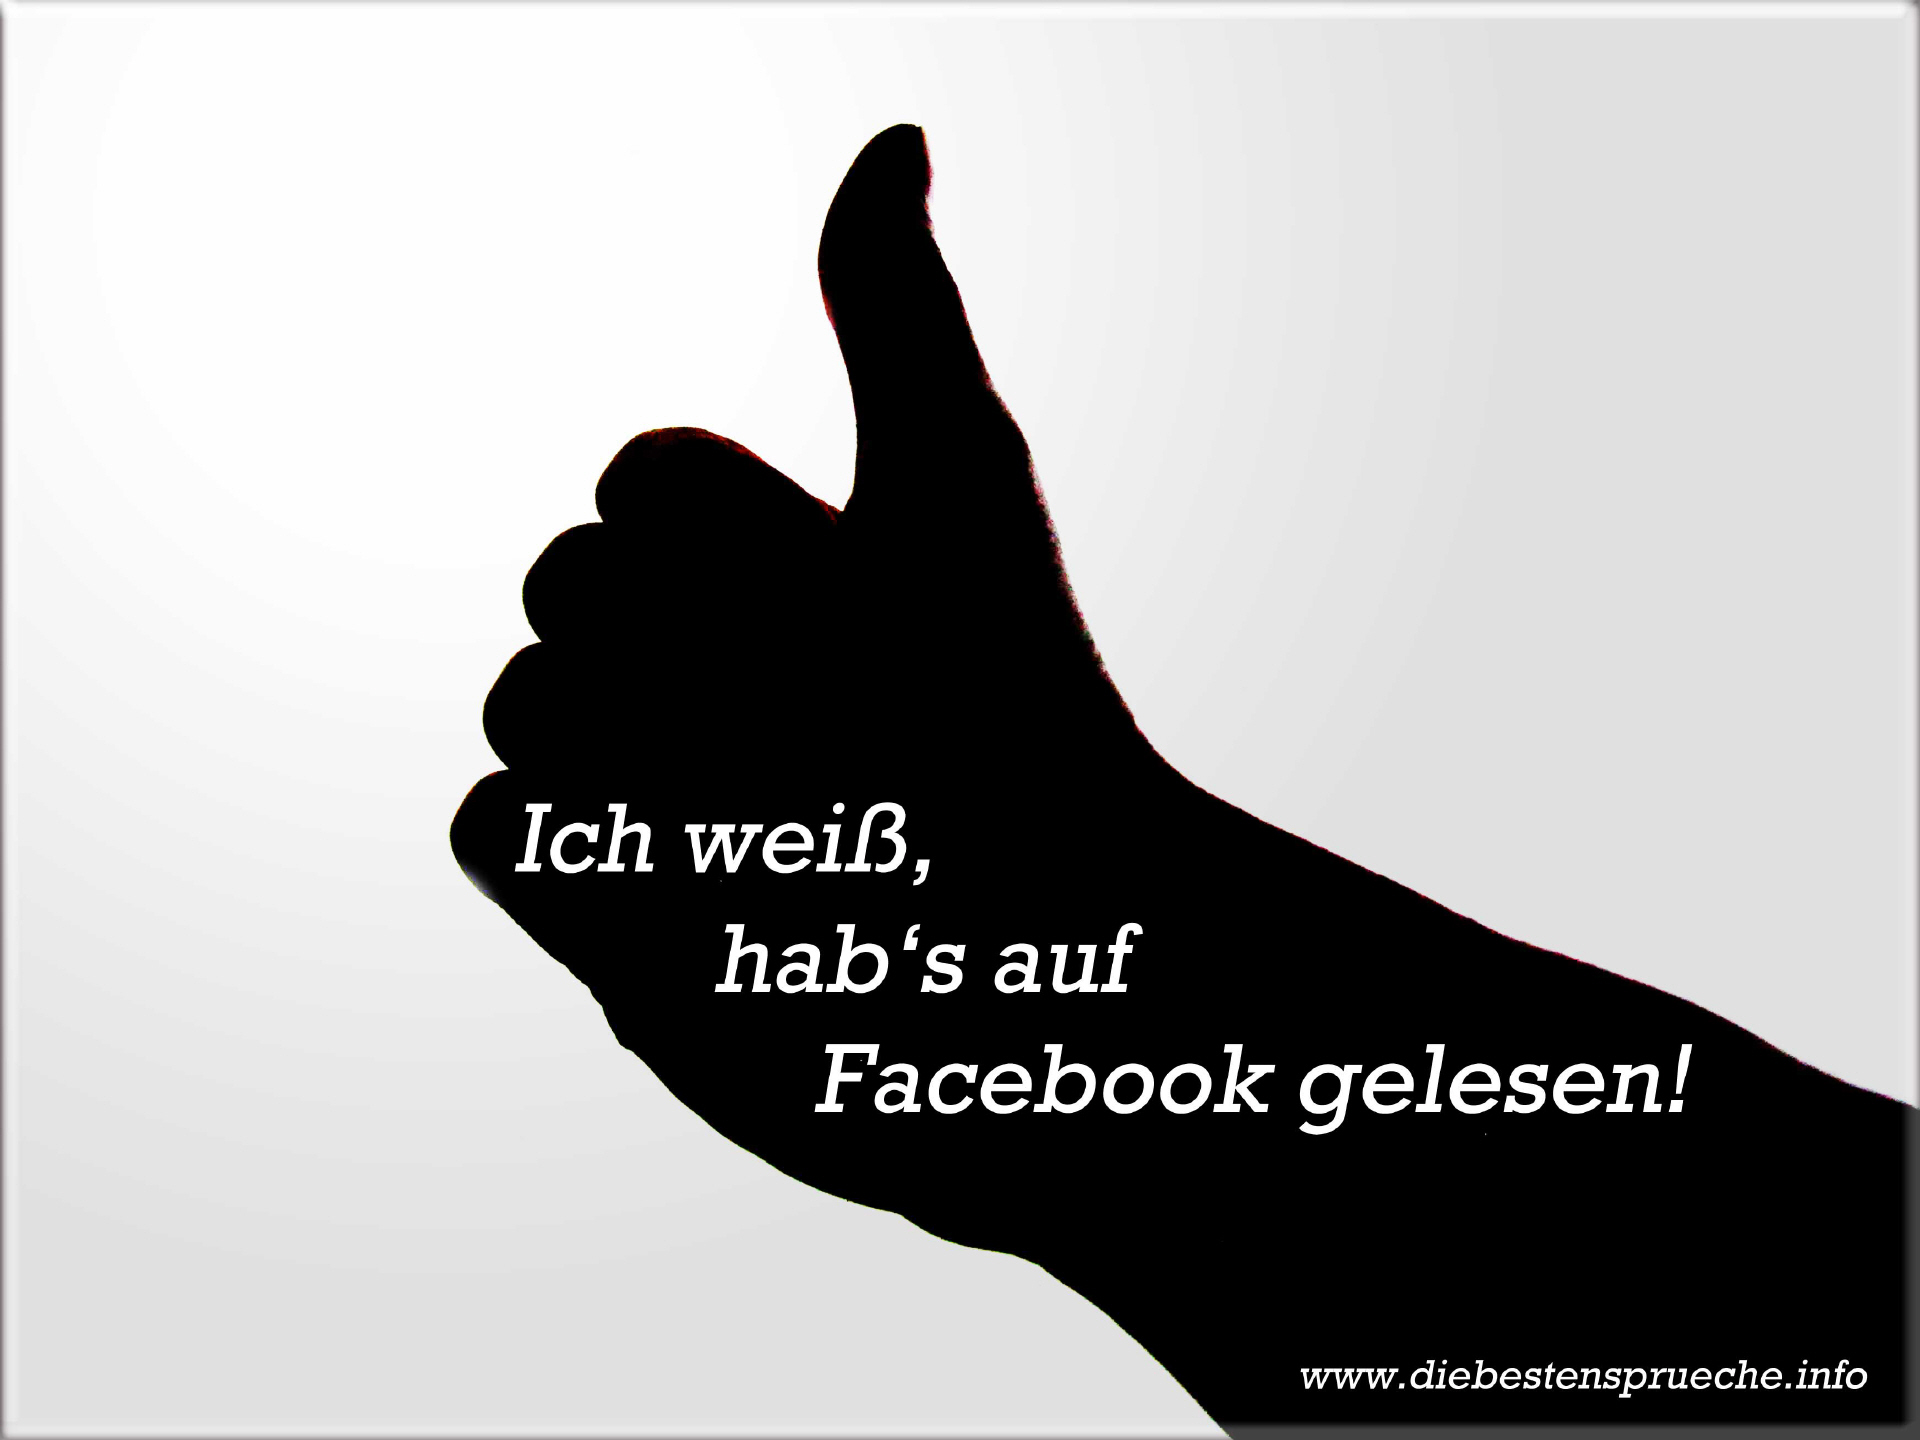 facebook pinnwand sprüche liebe Facebook Sprüche facebook pinnwand sprüche liebe